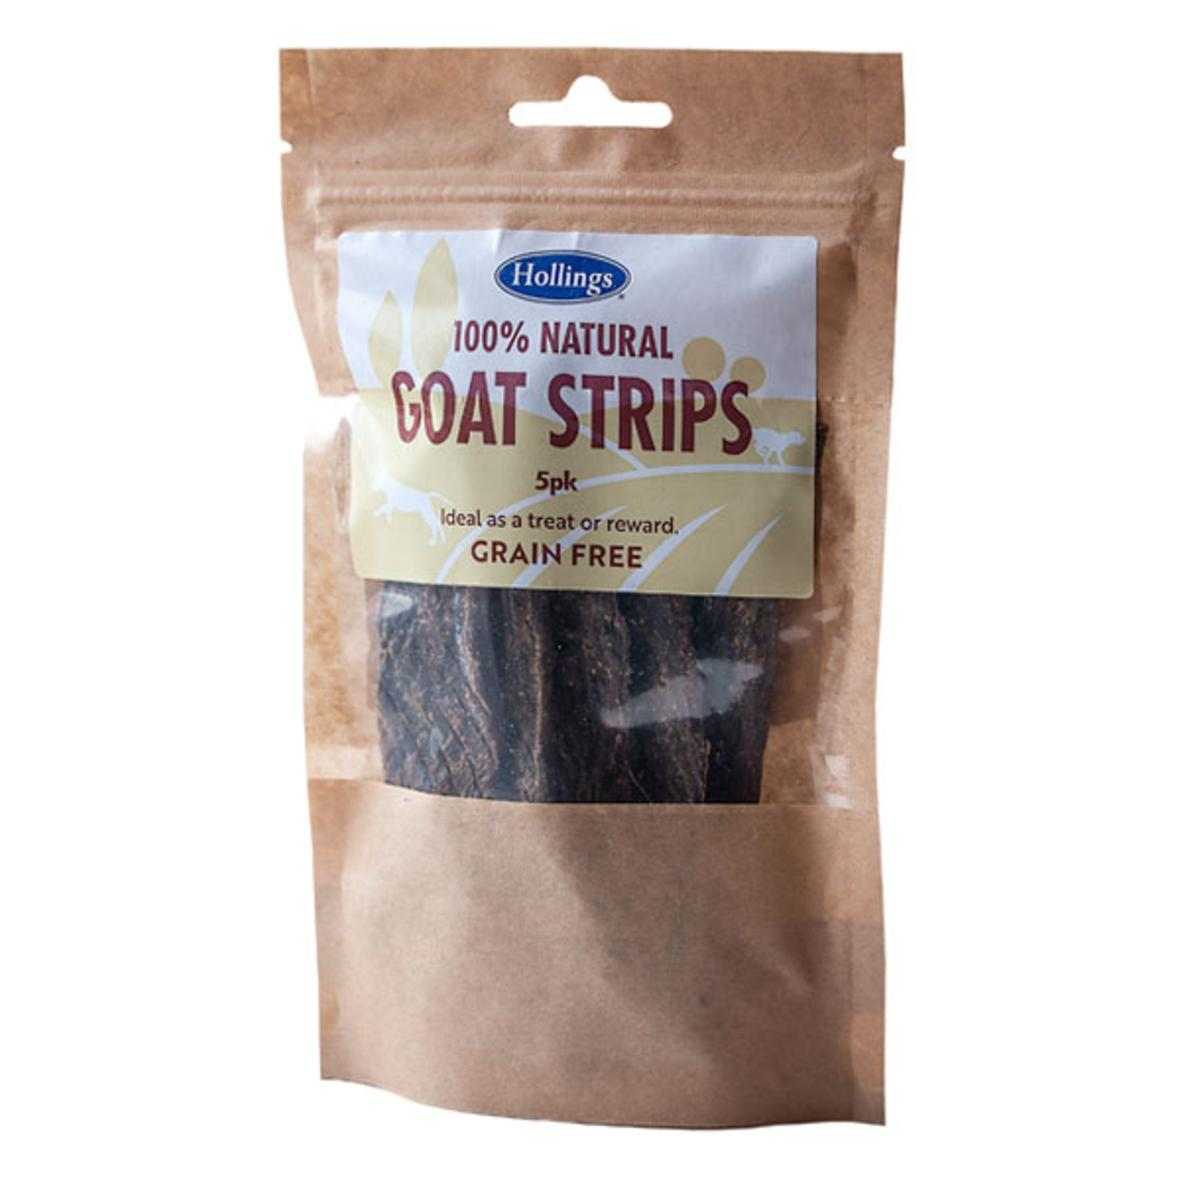 Hollings Goat Strips 5pcs